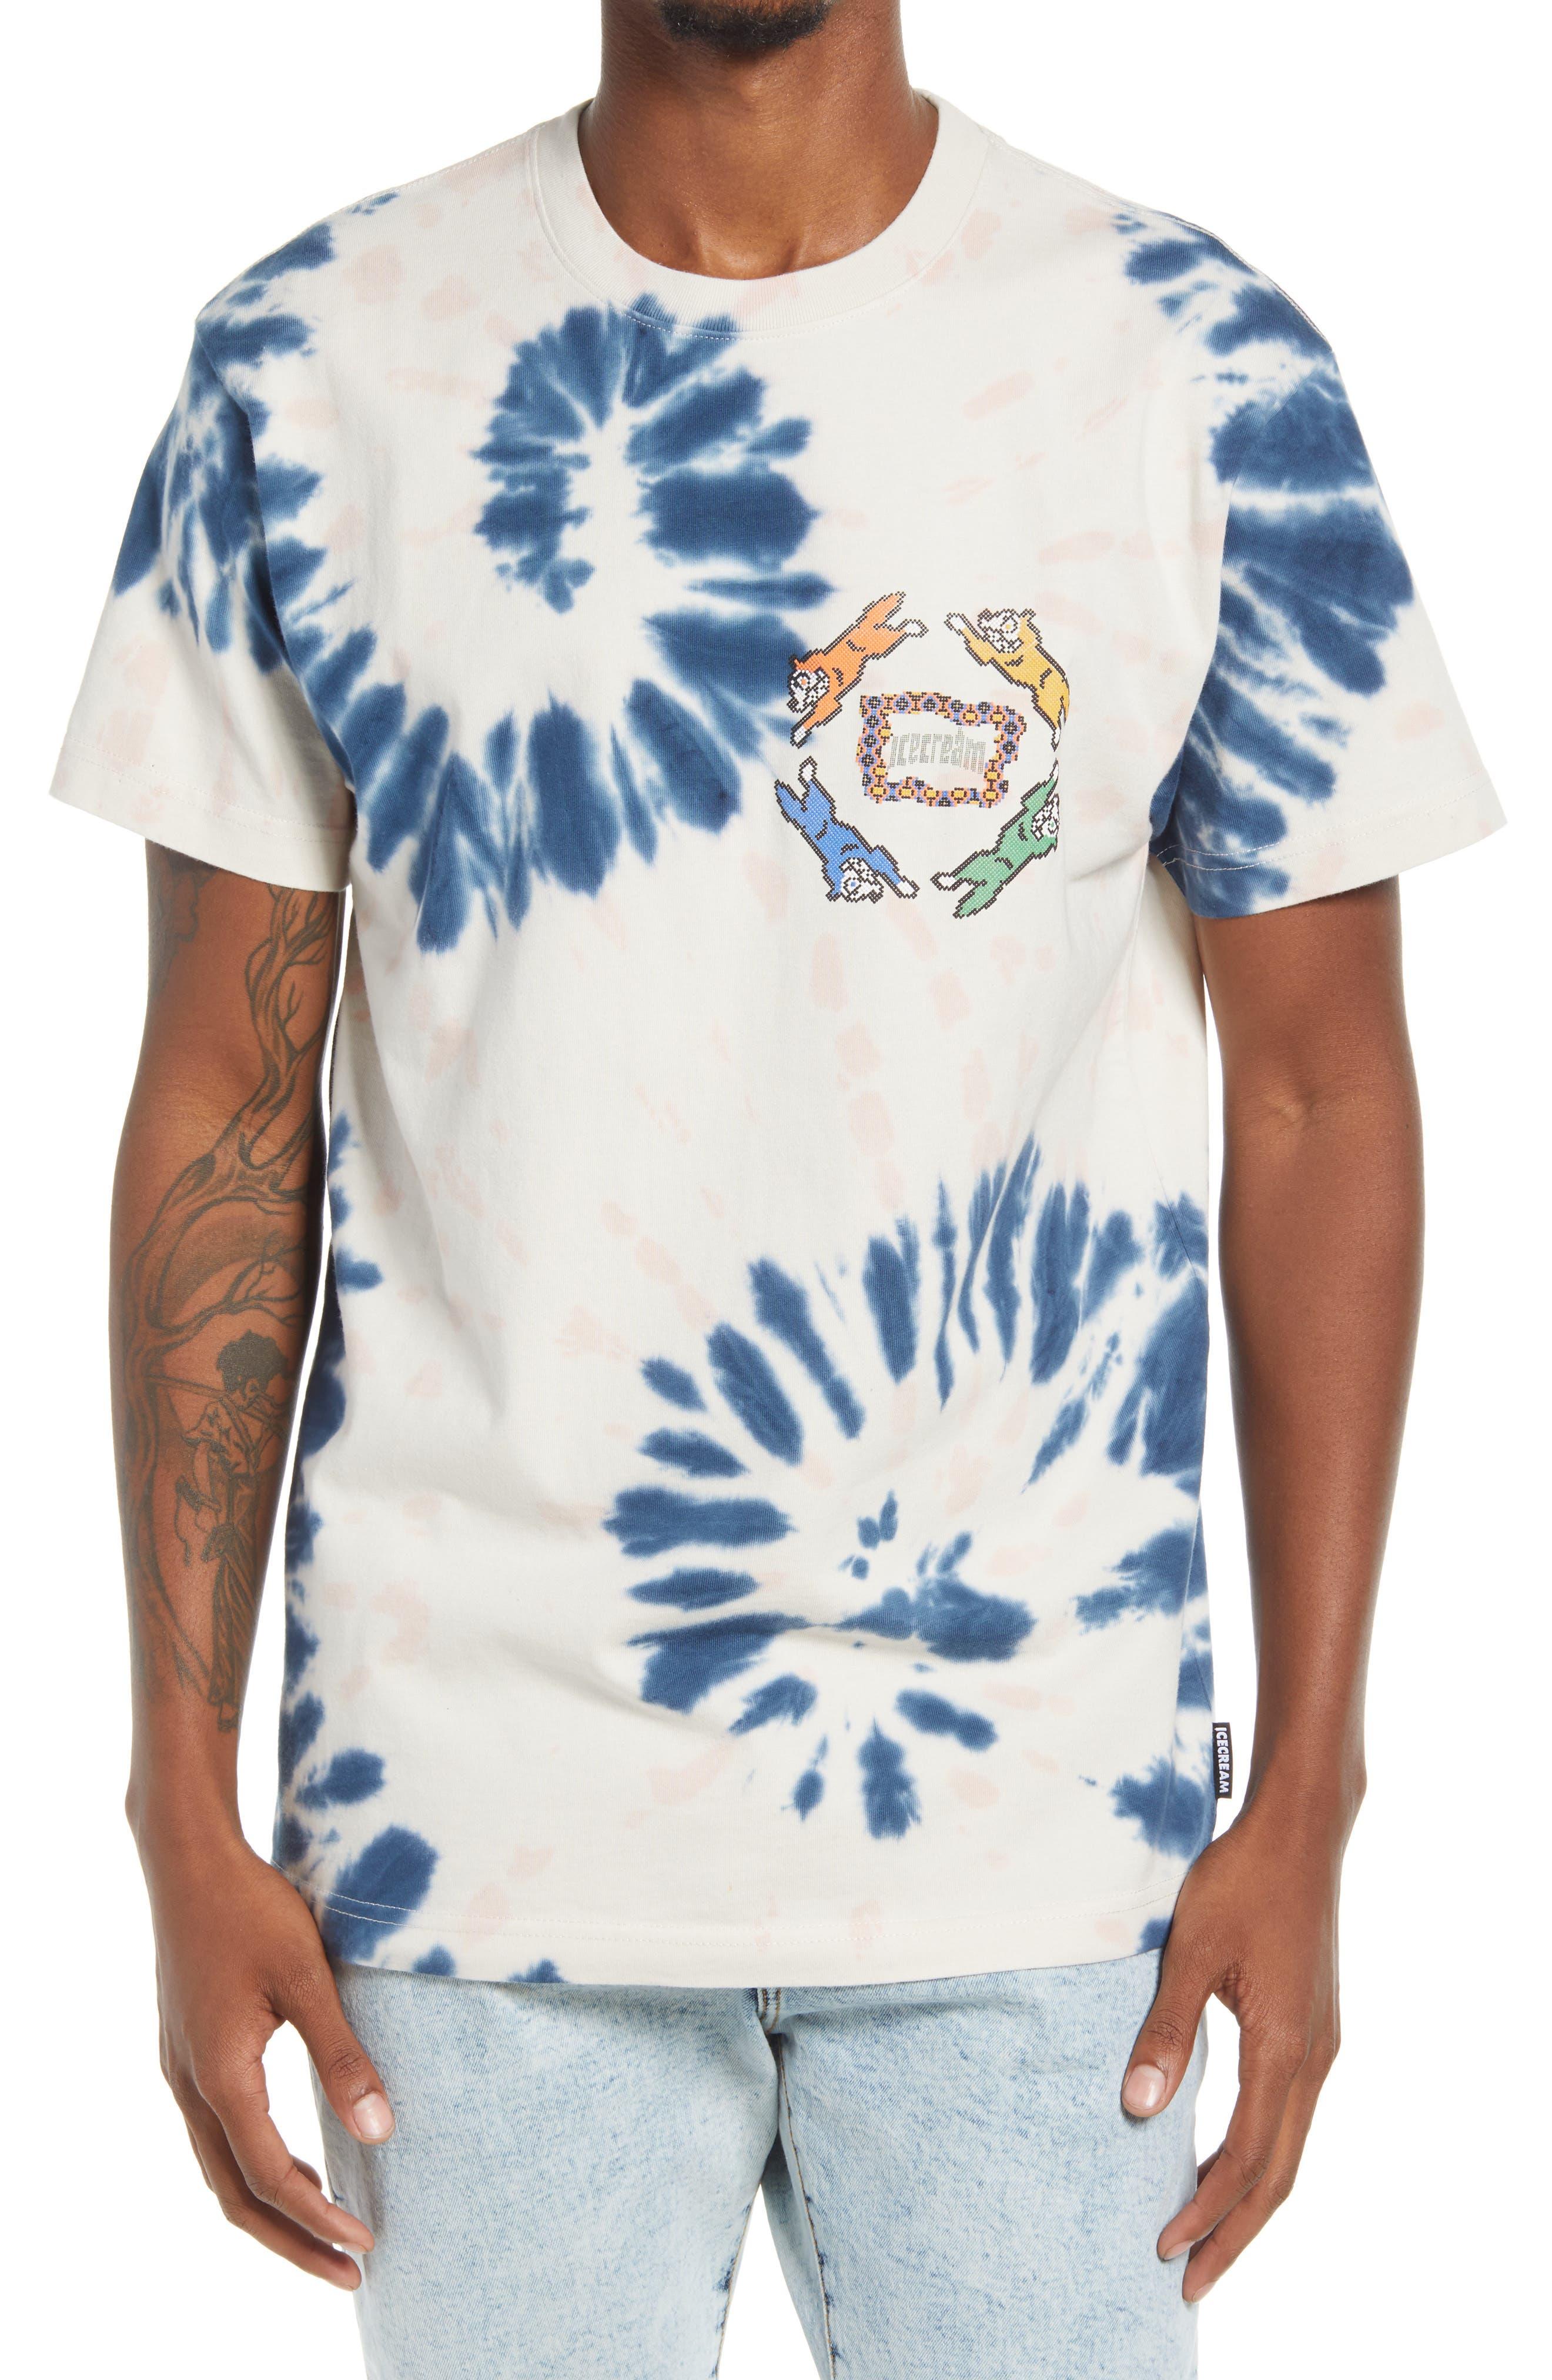 Men's Circle Tie Dye T-Shirt